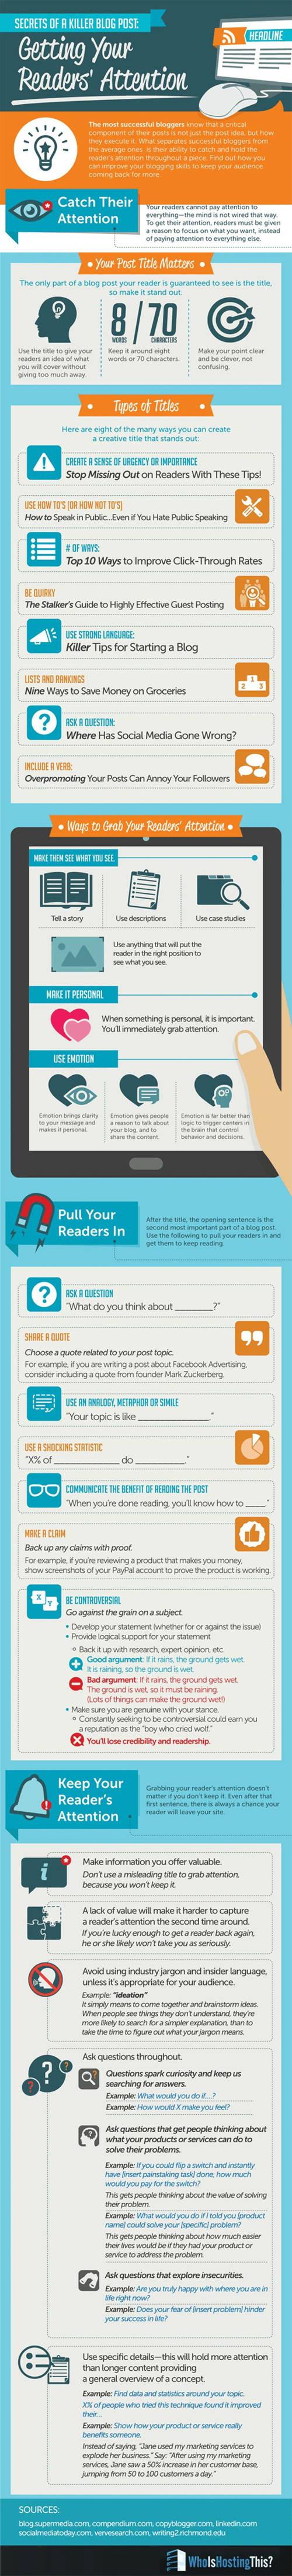 XXCómo escribir mejores post para tu blog #infografía